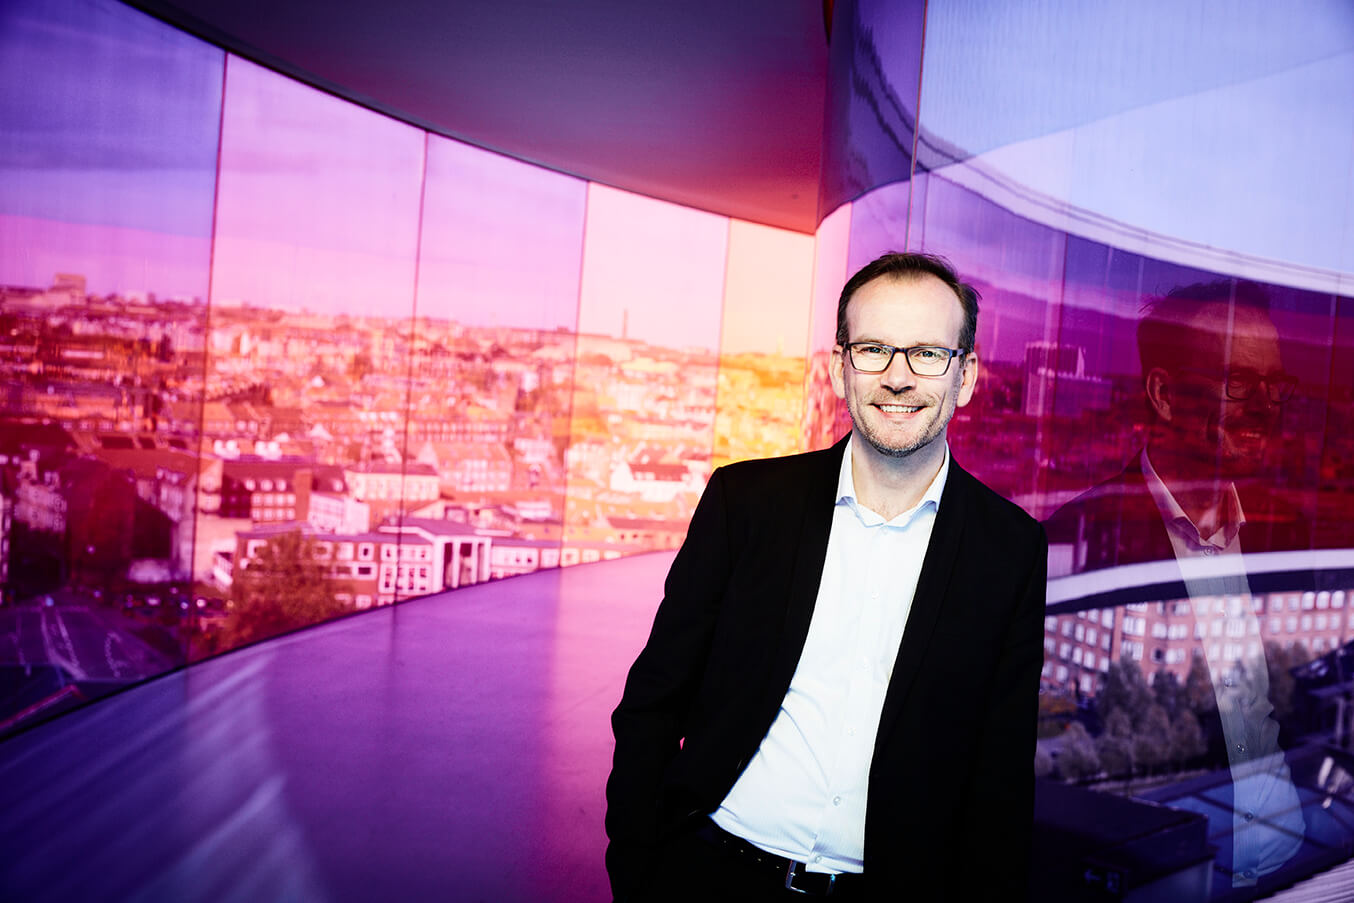 Tidligere direktør i VisitAarhus og Aarhus Lufthavn, Peer H. Kristensen, bliver ny direktør i Destination Vesterhavet.